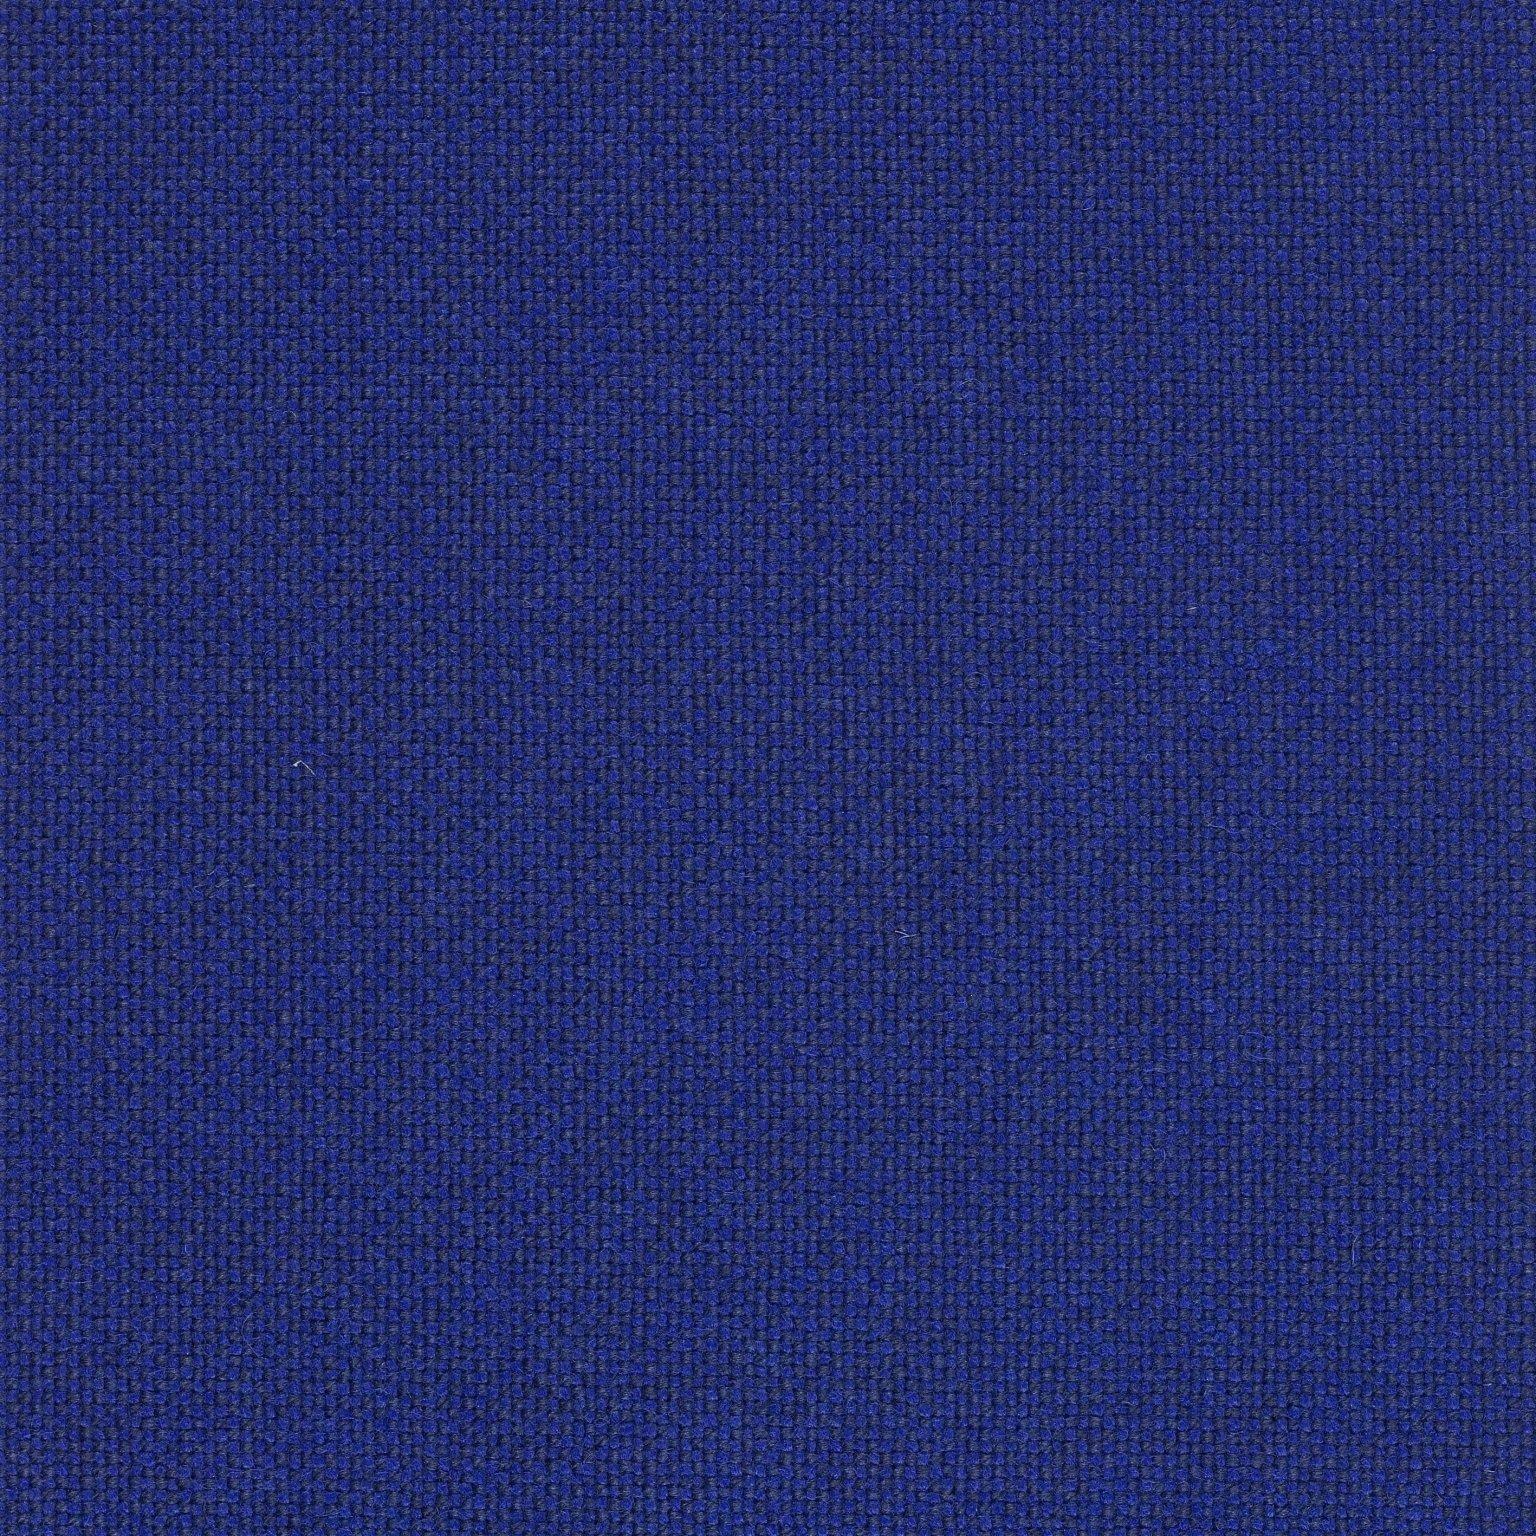 blå-grå malange hallingdal 65 - 773-0